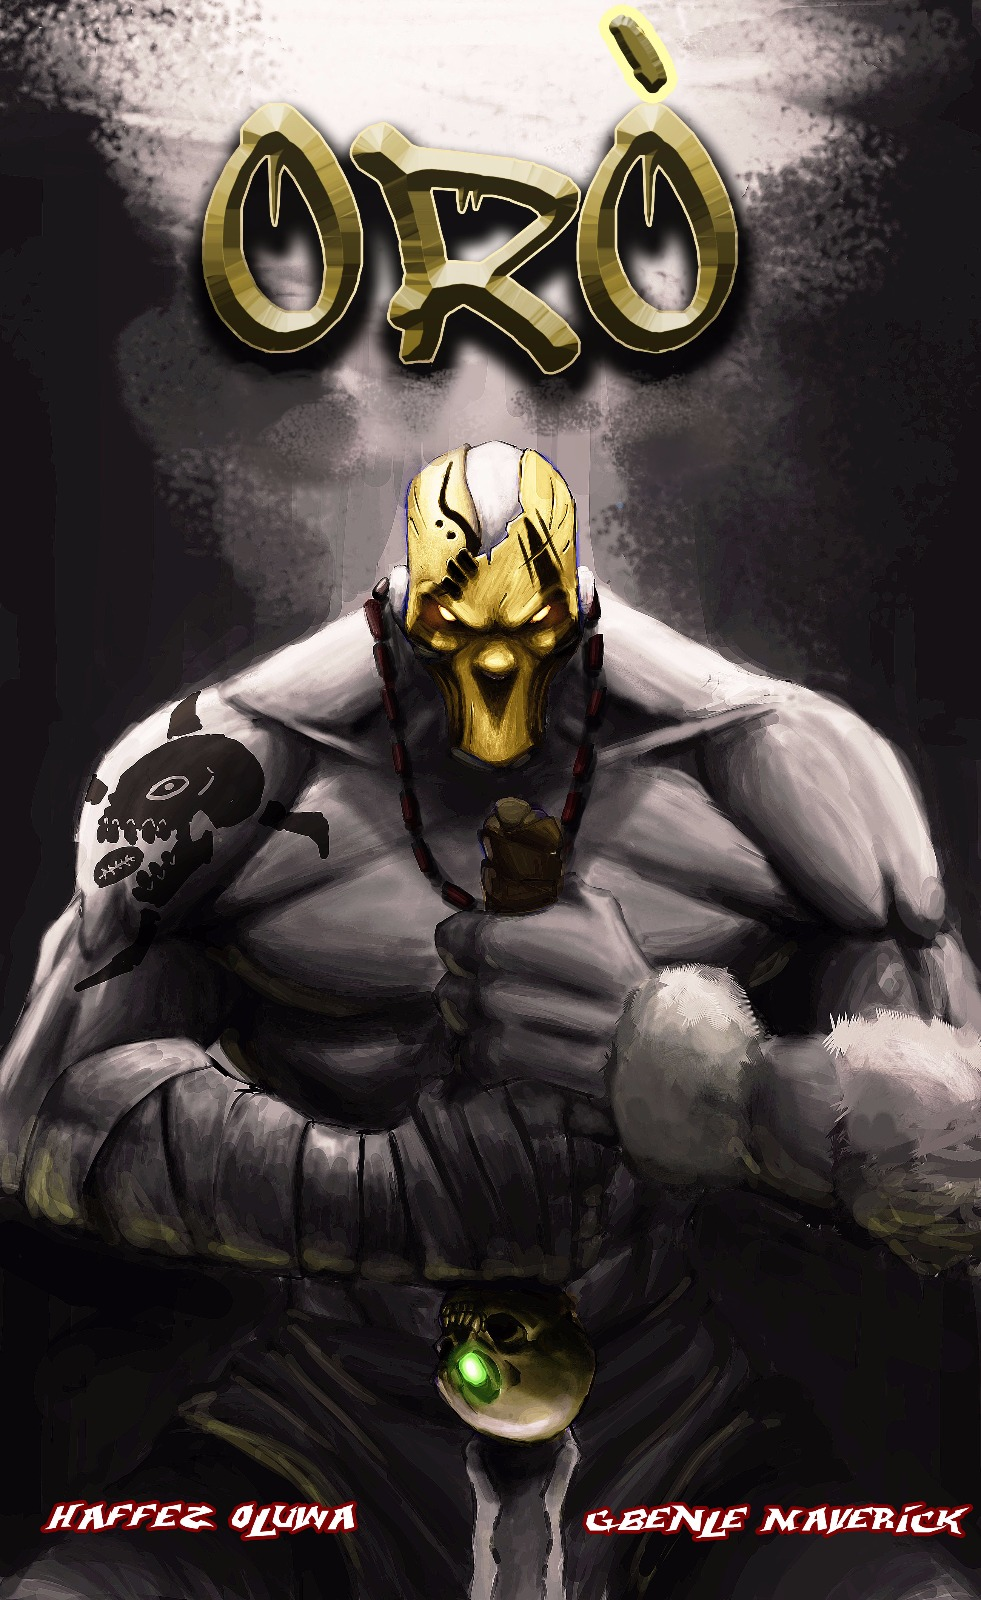 Oro by Mad! Comics. Written by Hafeez Oluwa, art by Gbenle Maverick